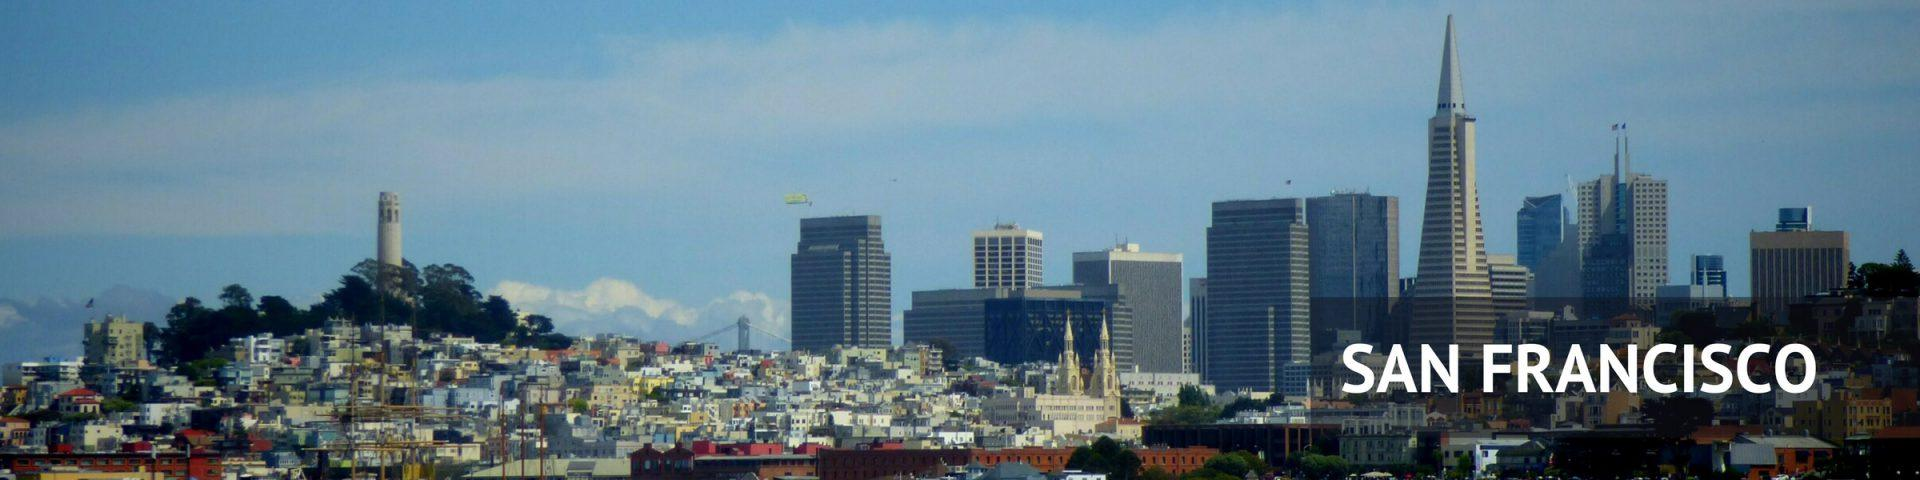 San Francisco Header